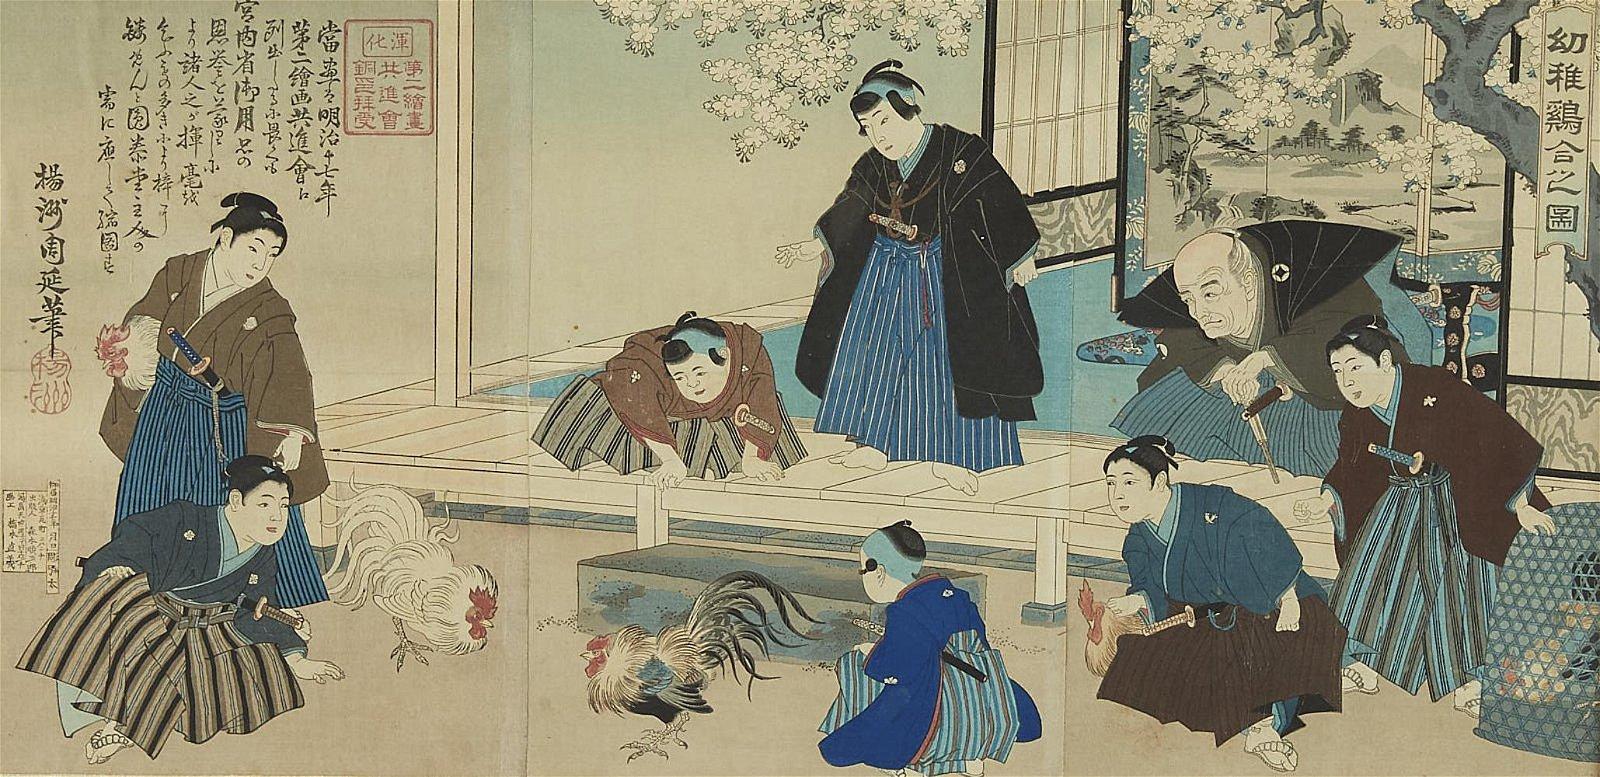 Chikanobu Japanese Woodblock Print Triptych of a